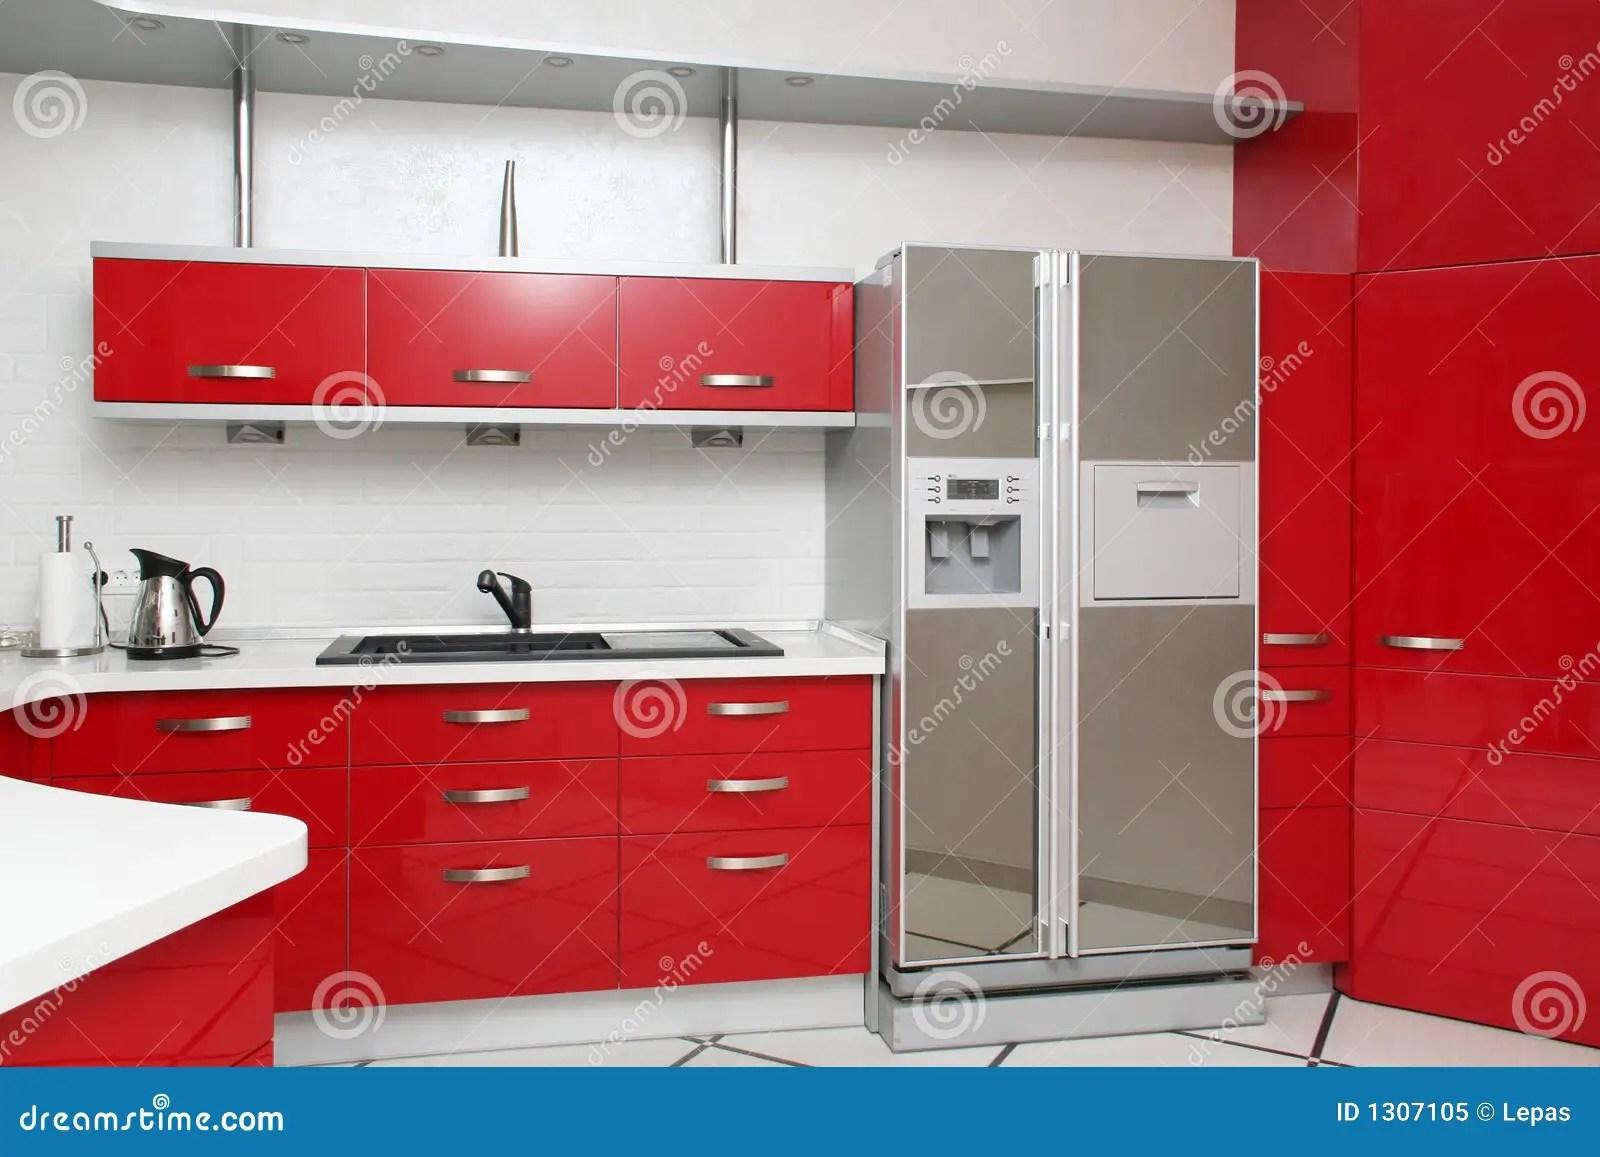 Credenza Ikea Rossa : Cucina ikea laccata rossa bianca lucida moderna